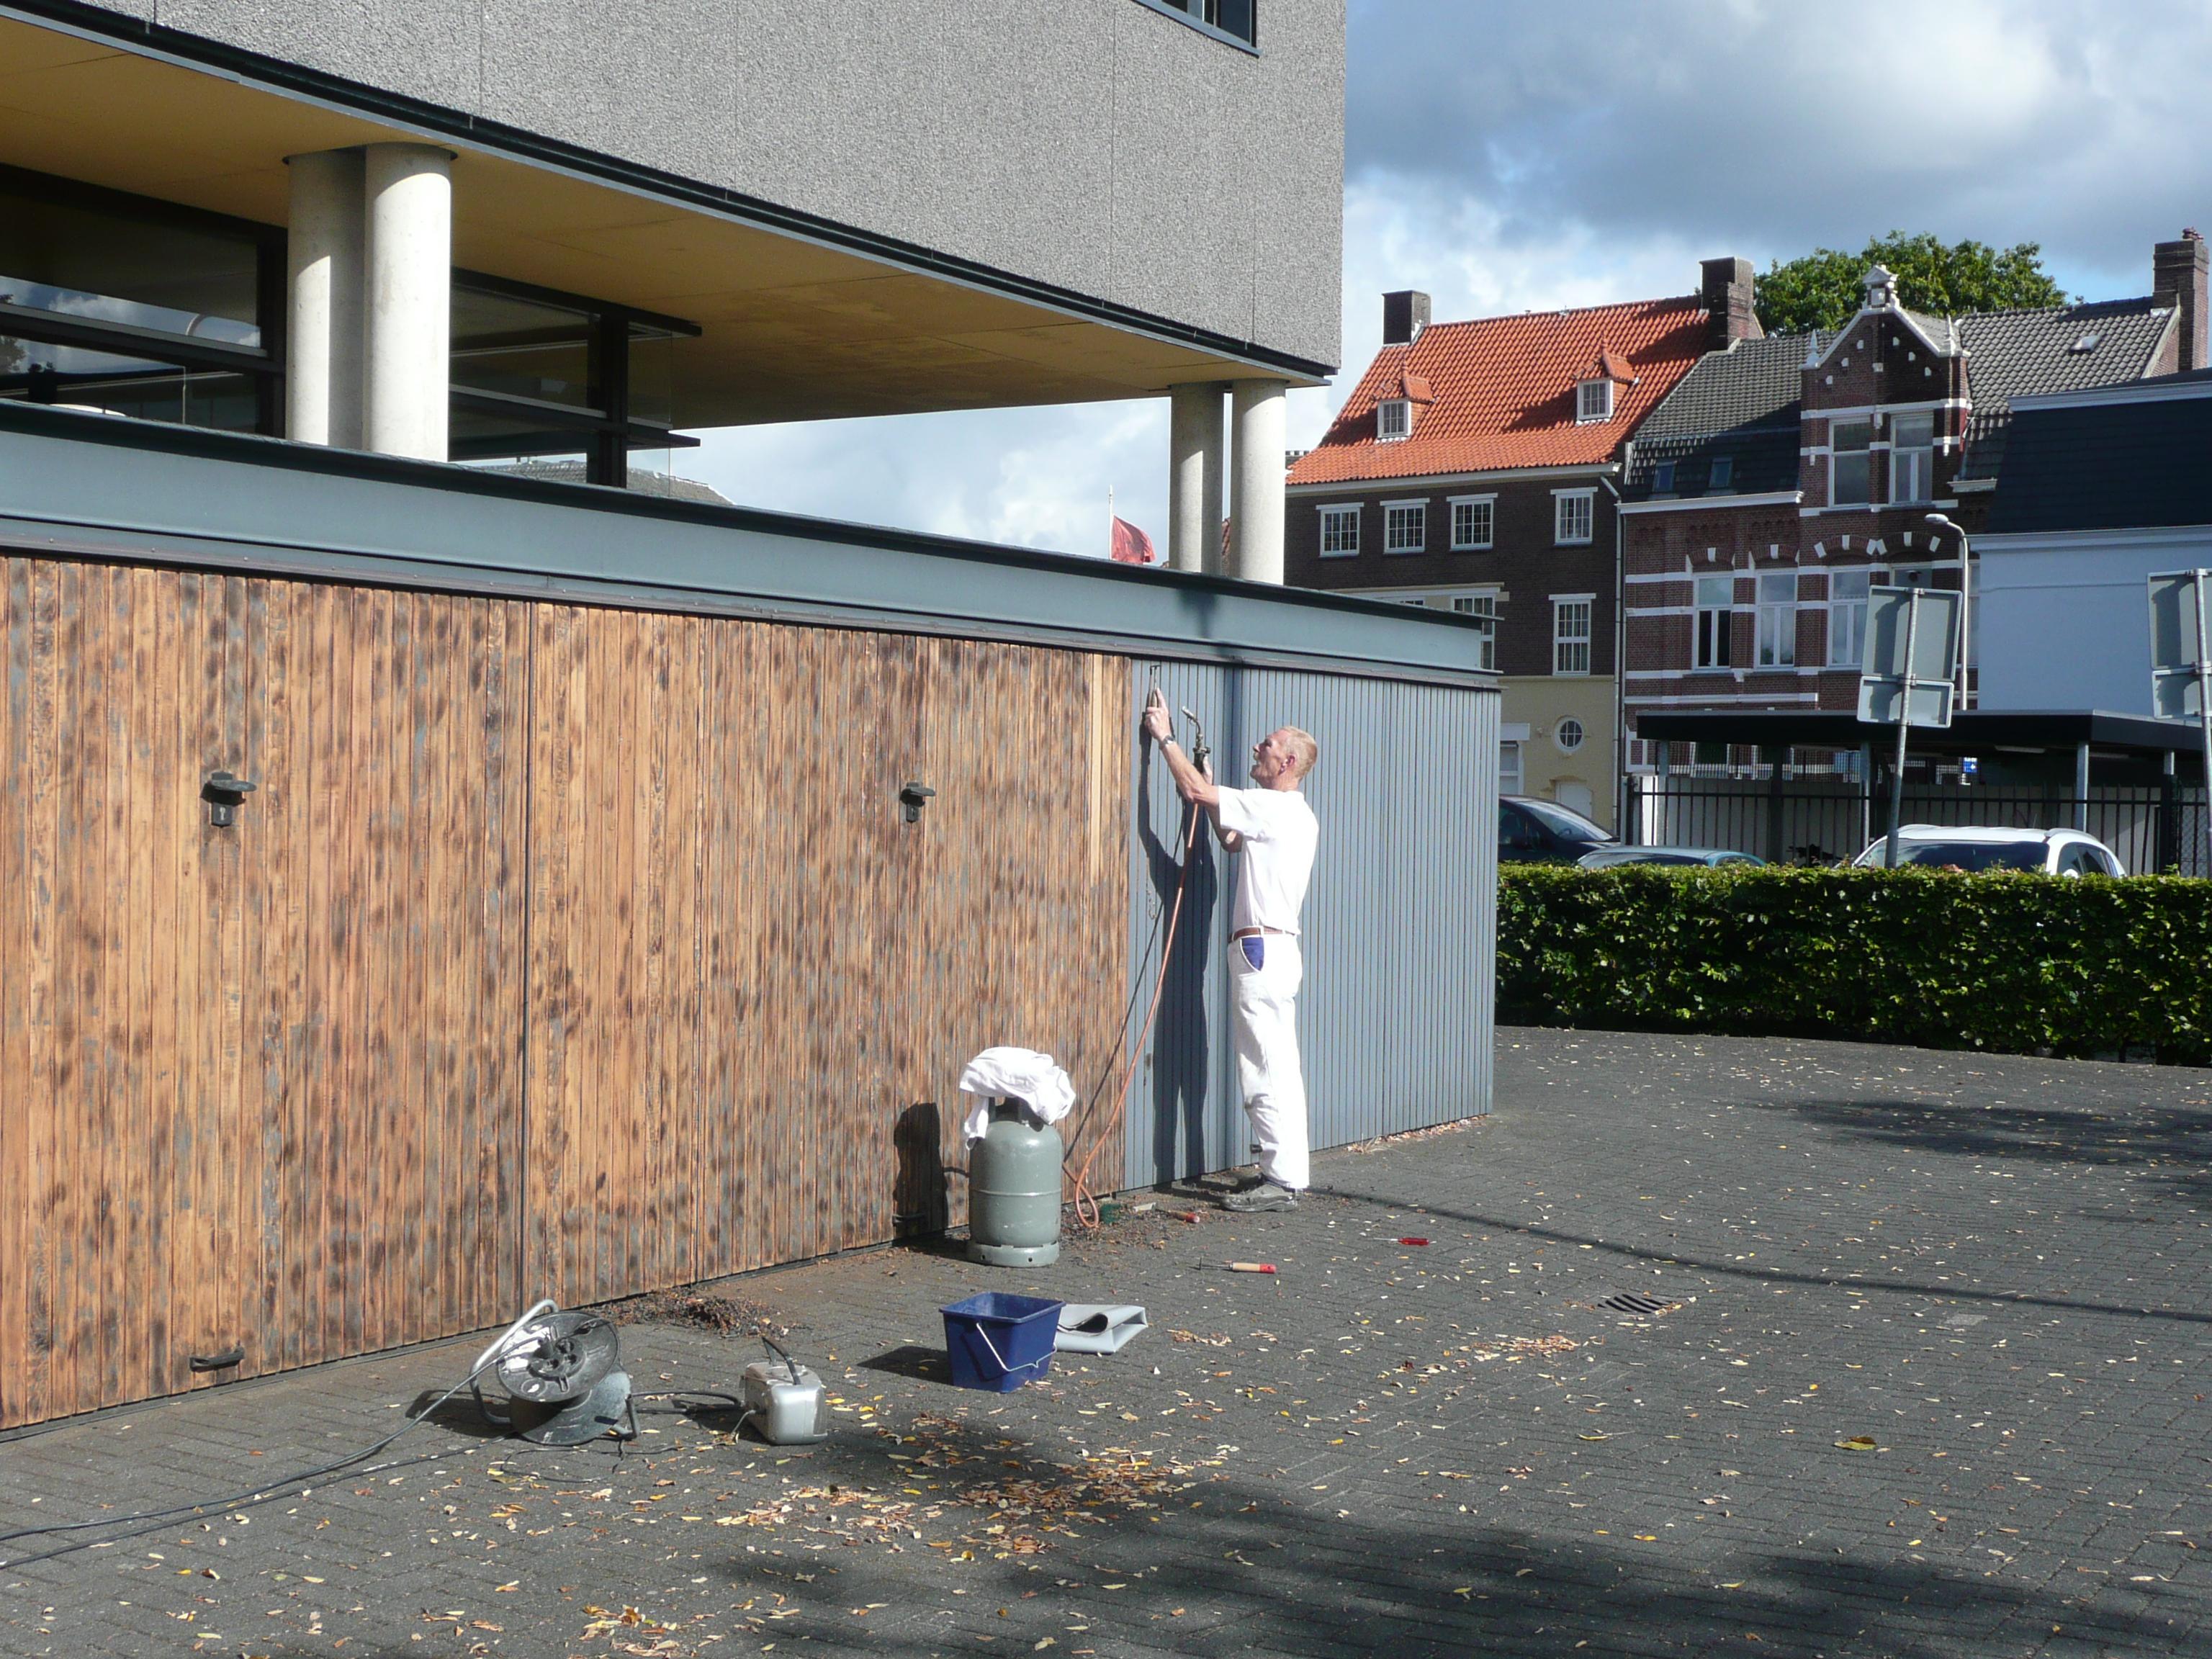 vve-pontplein-tilburg-1